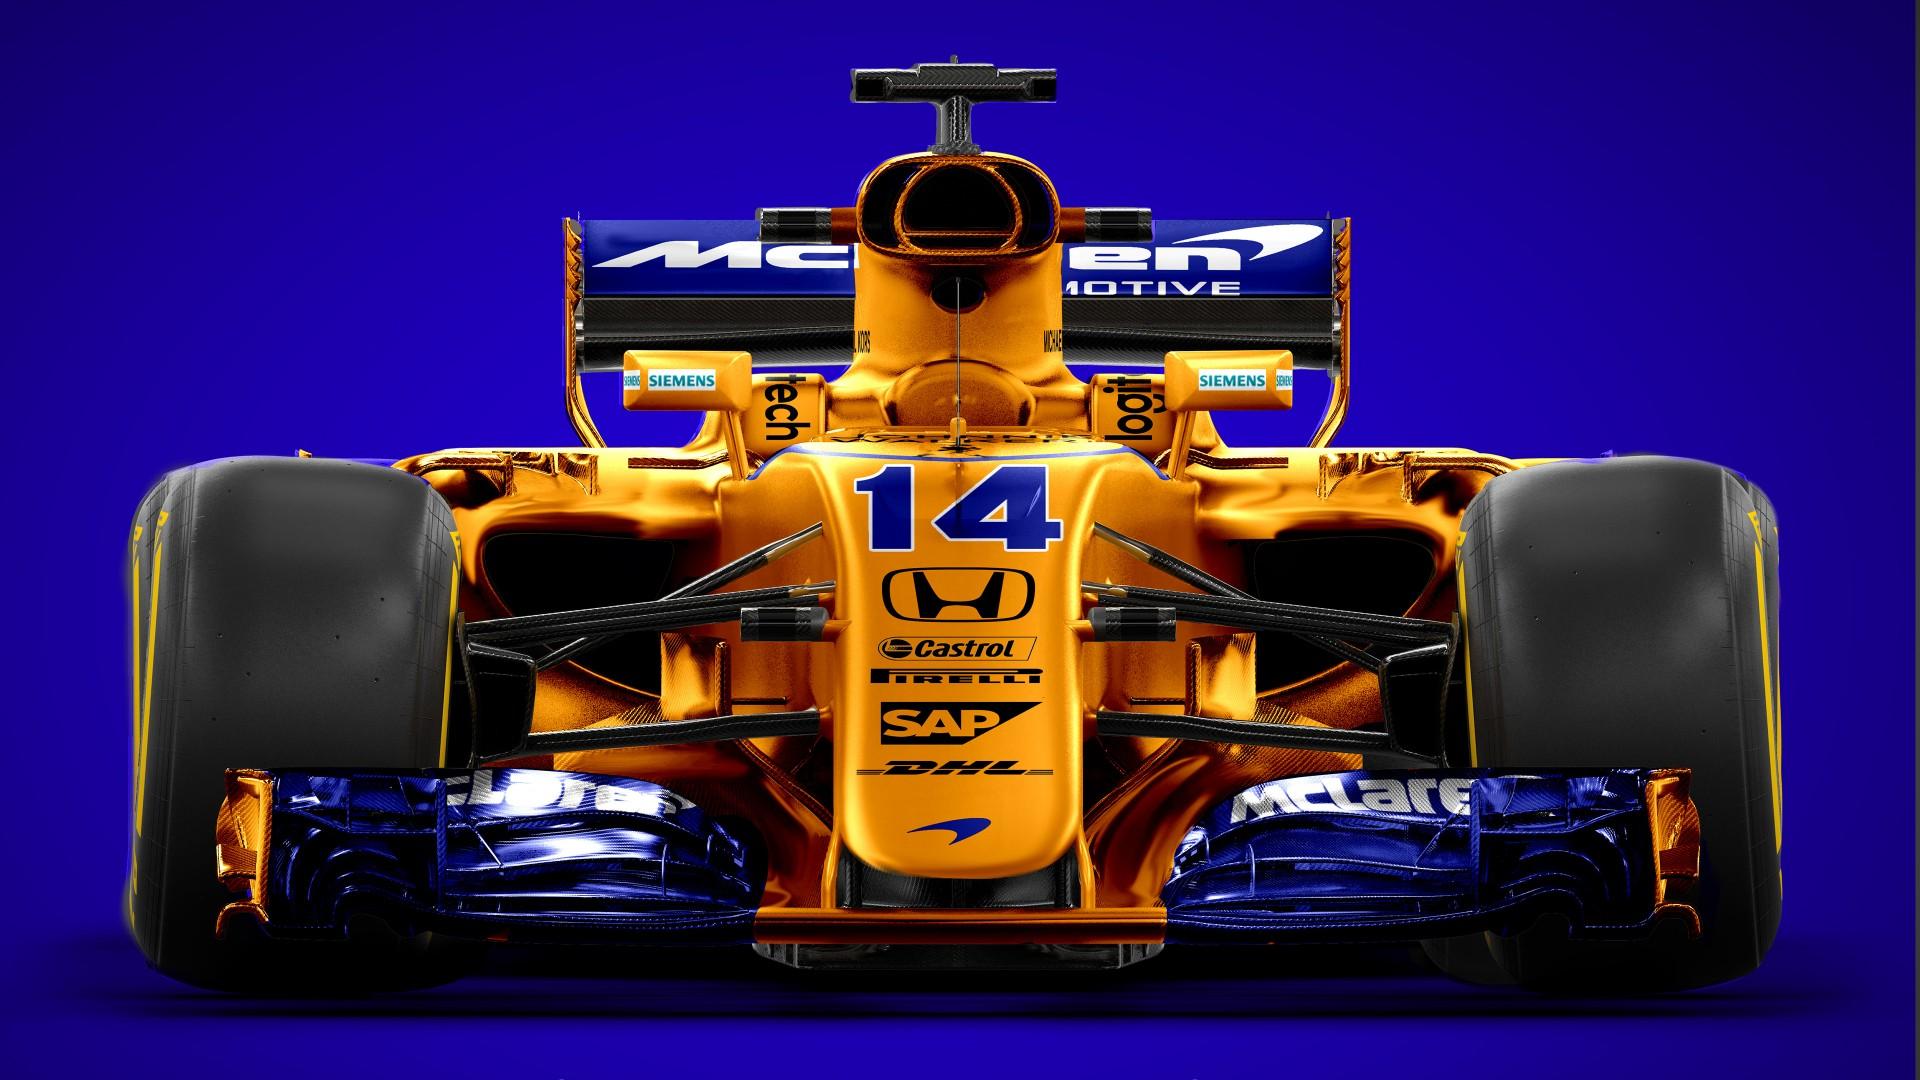 F1 Iphone Wallpaper Mclaren F1 4k Wallpaper Hd Car Wallpapers Id 8072